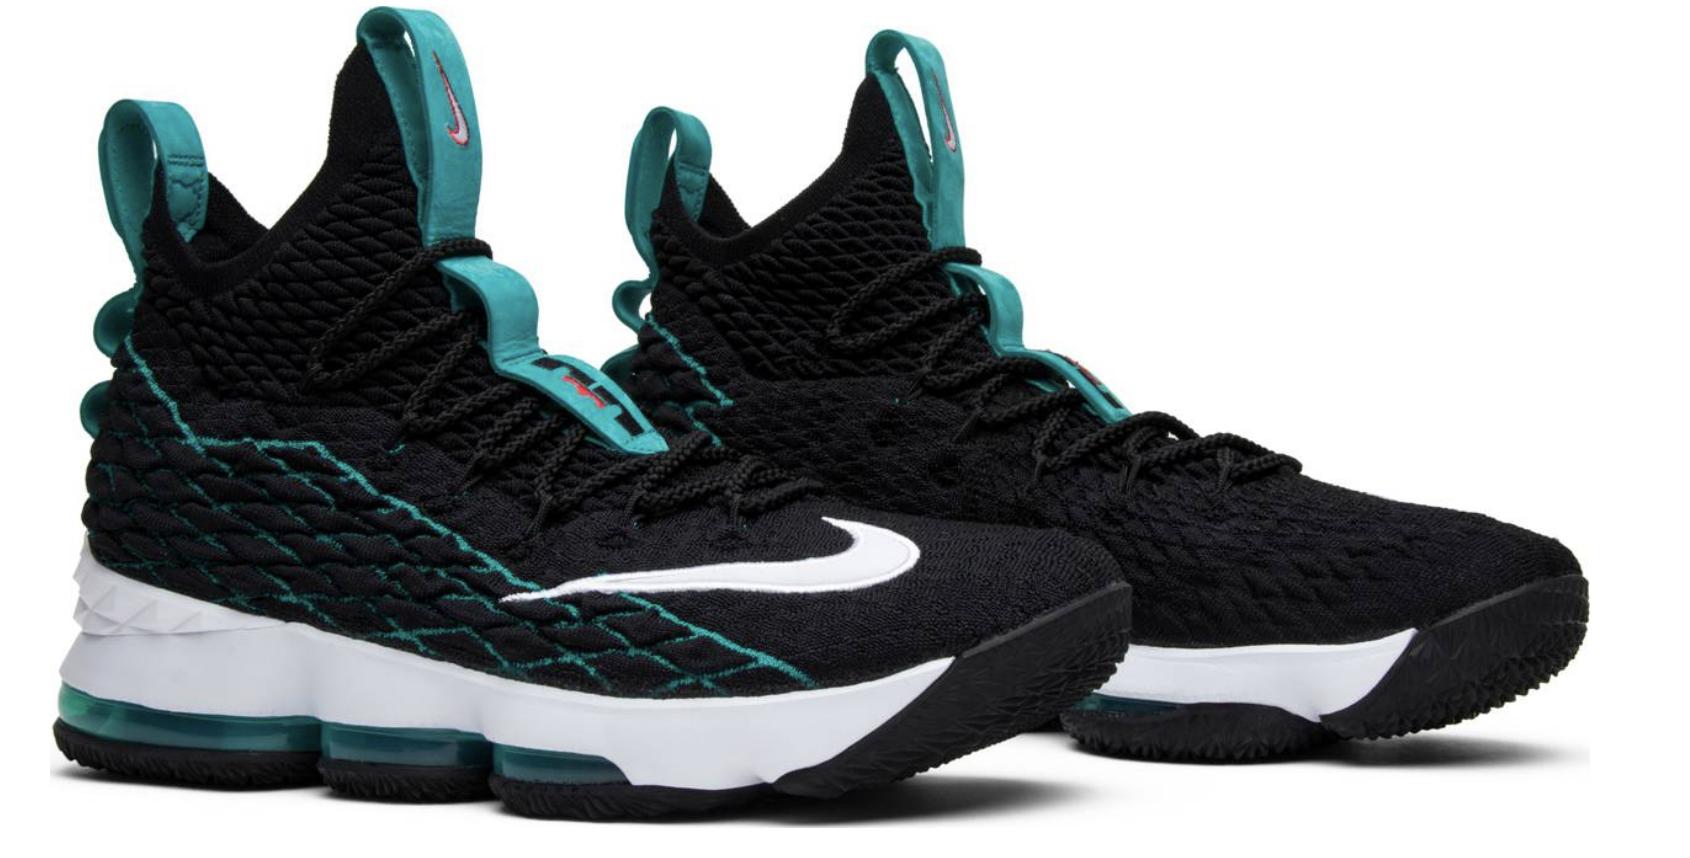 LeBron 15 'Griffey' PE Sneakers / $290